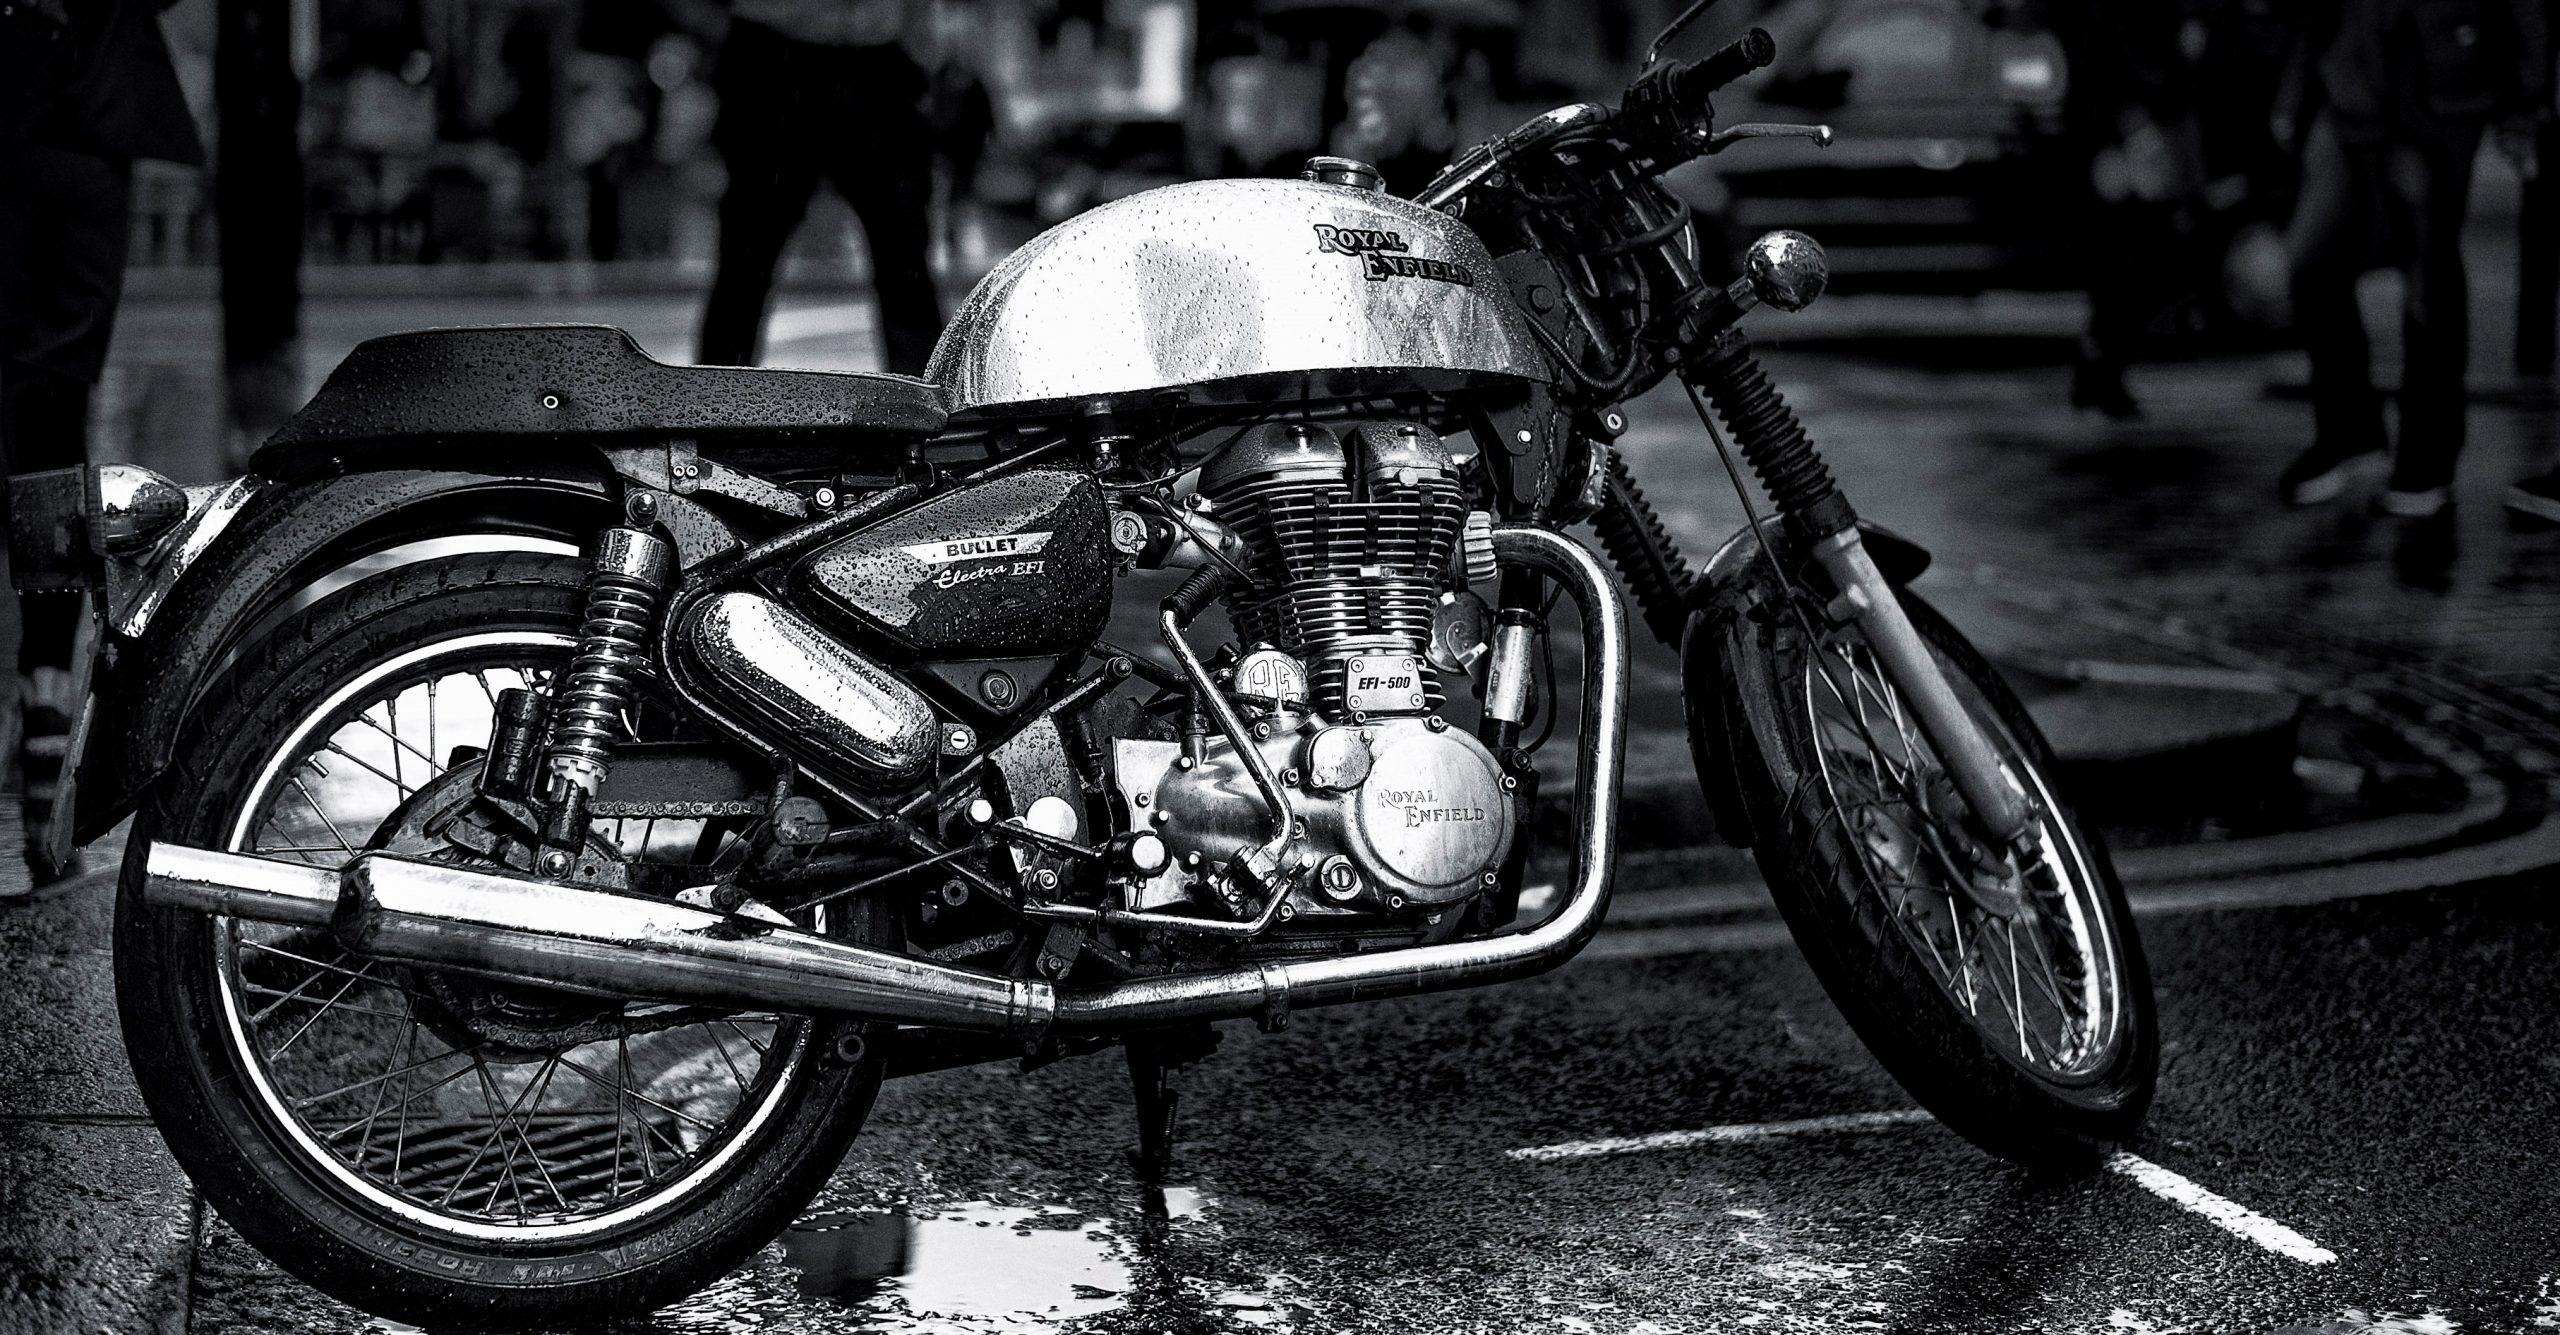 Royal Enfield motorcycle in London